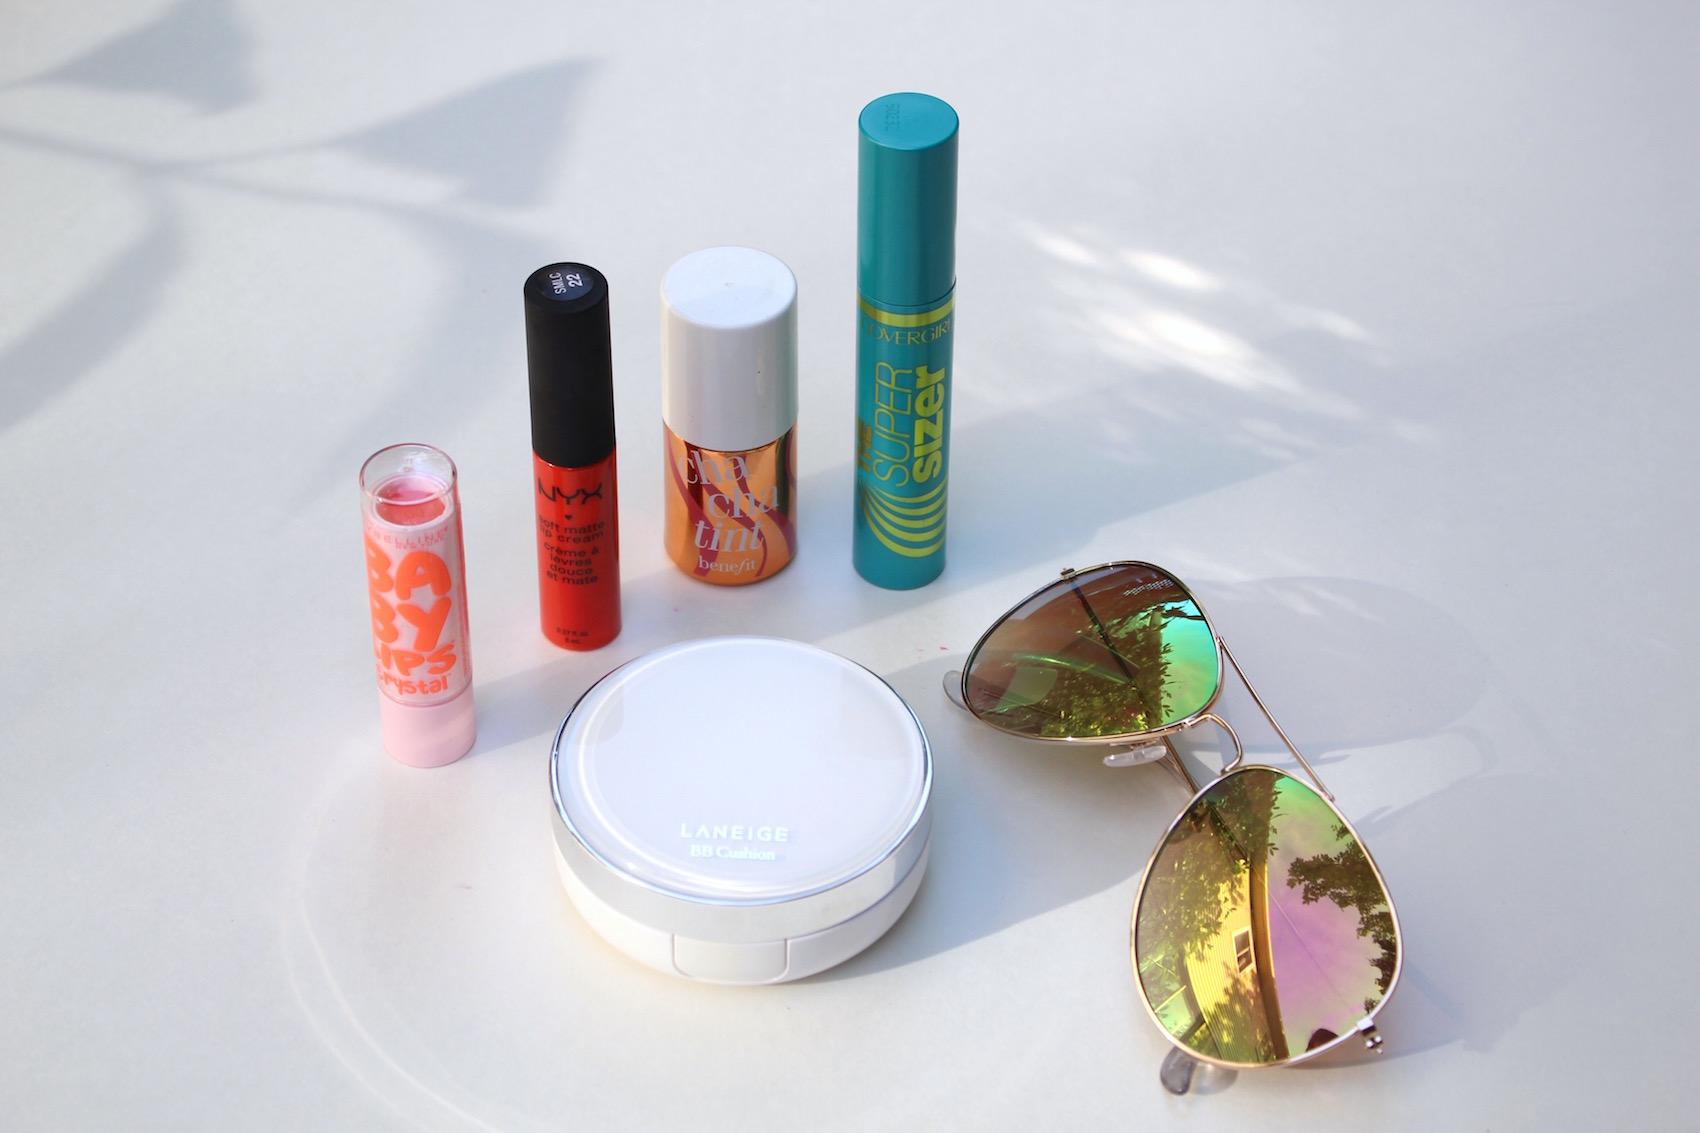 WoahStyle.com - Makeup: Sexy Summer Glow